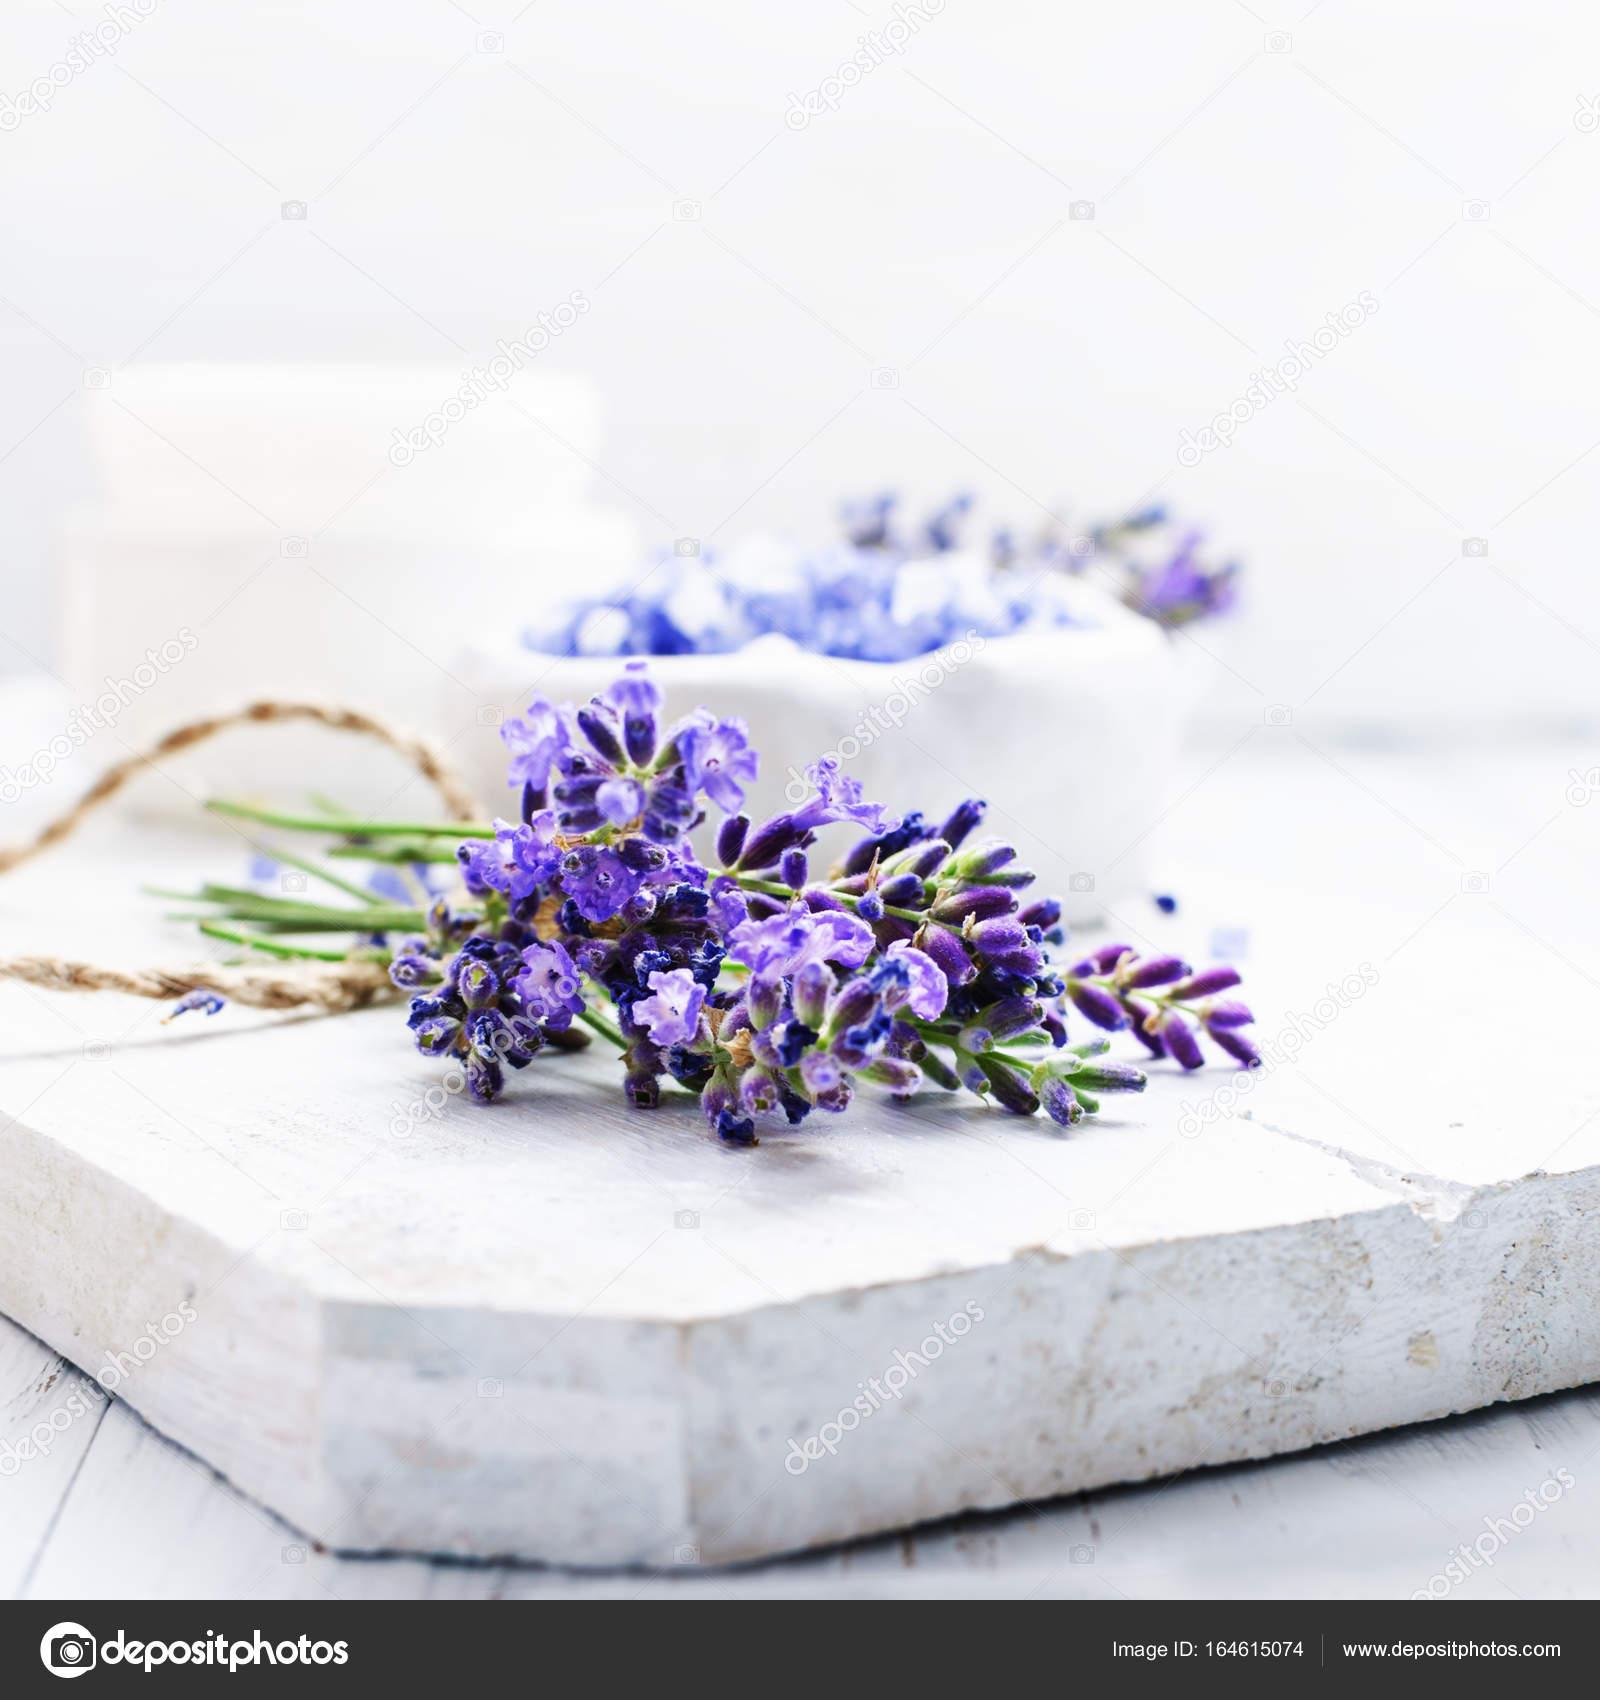 Zutaten Fur Lavendel Spa Stockfoto C Laroinovaolga 164615074